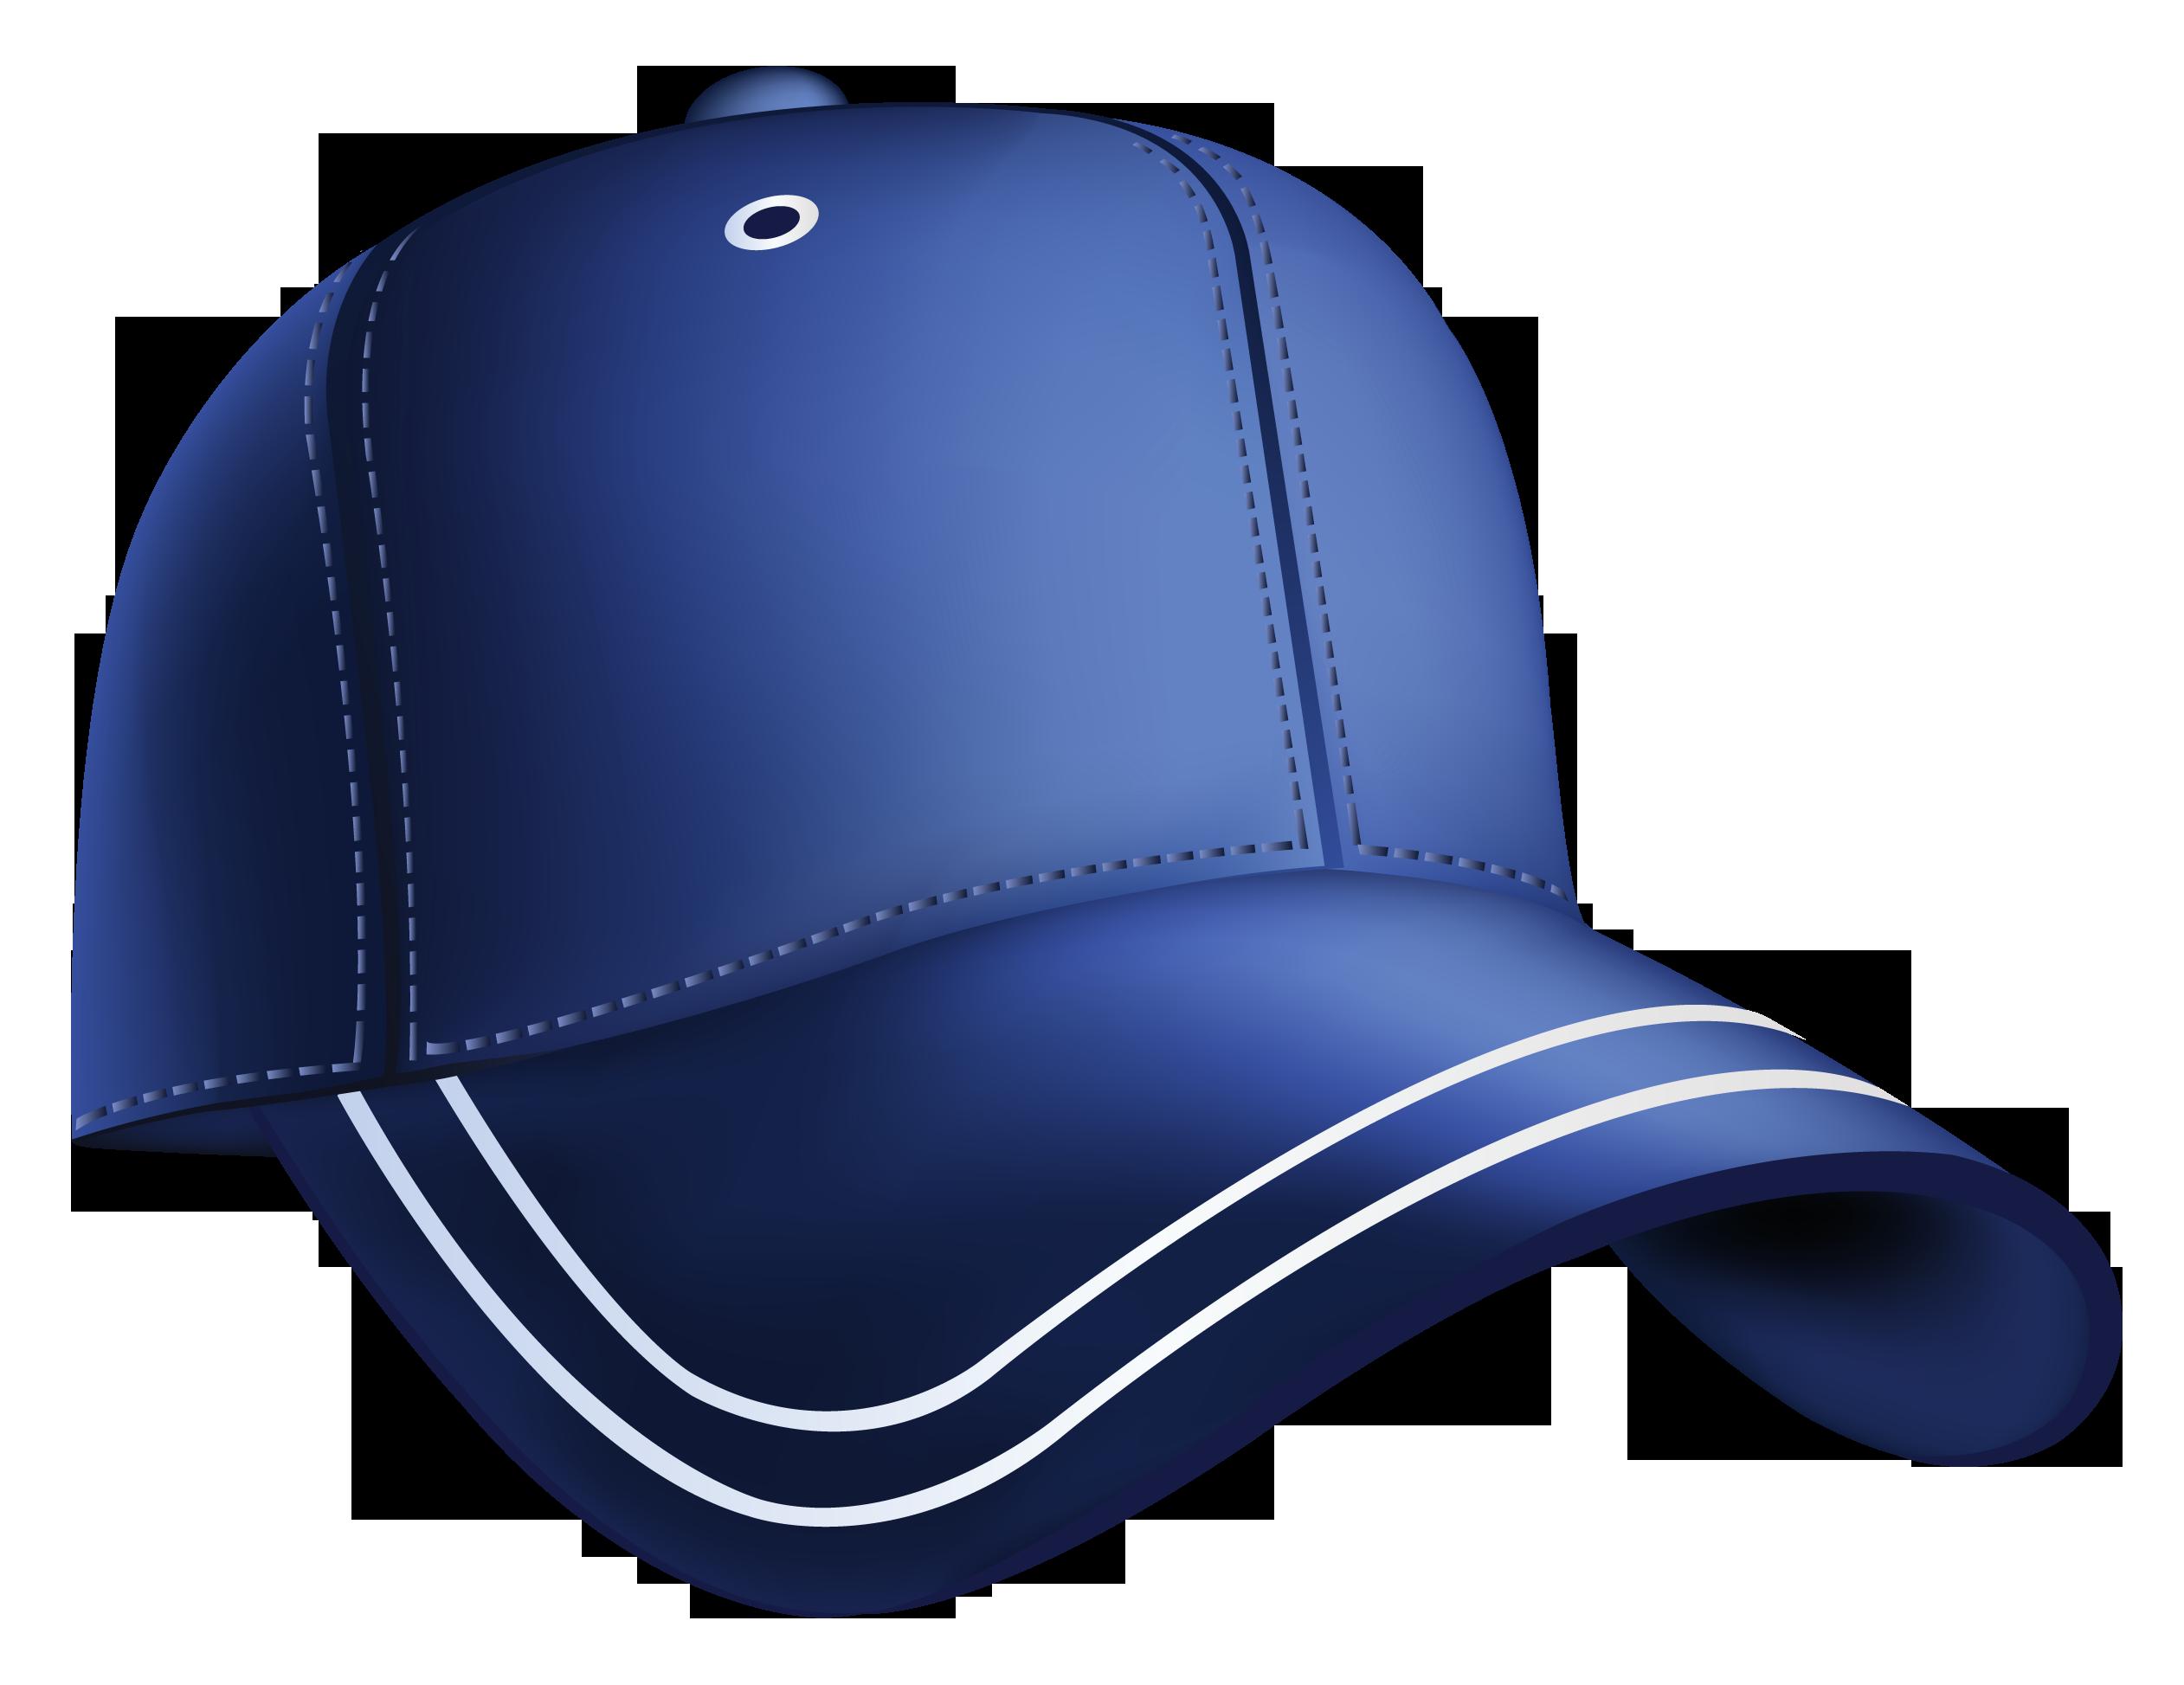 Baseball Hat Clip Art Cliparts Co-Baseball Hat Clip Art Cliparts Co-4